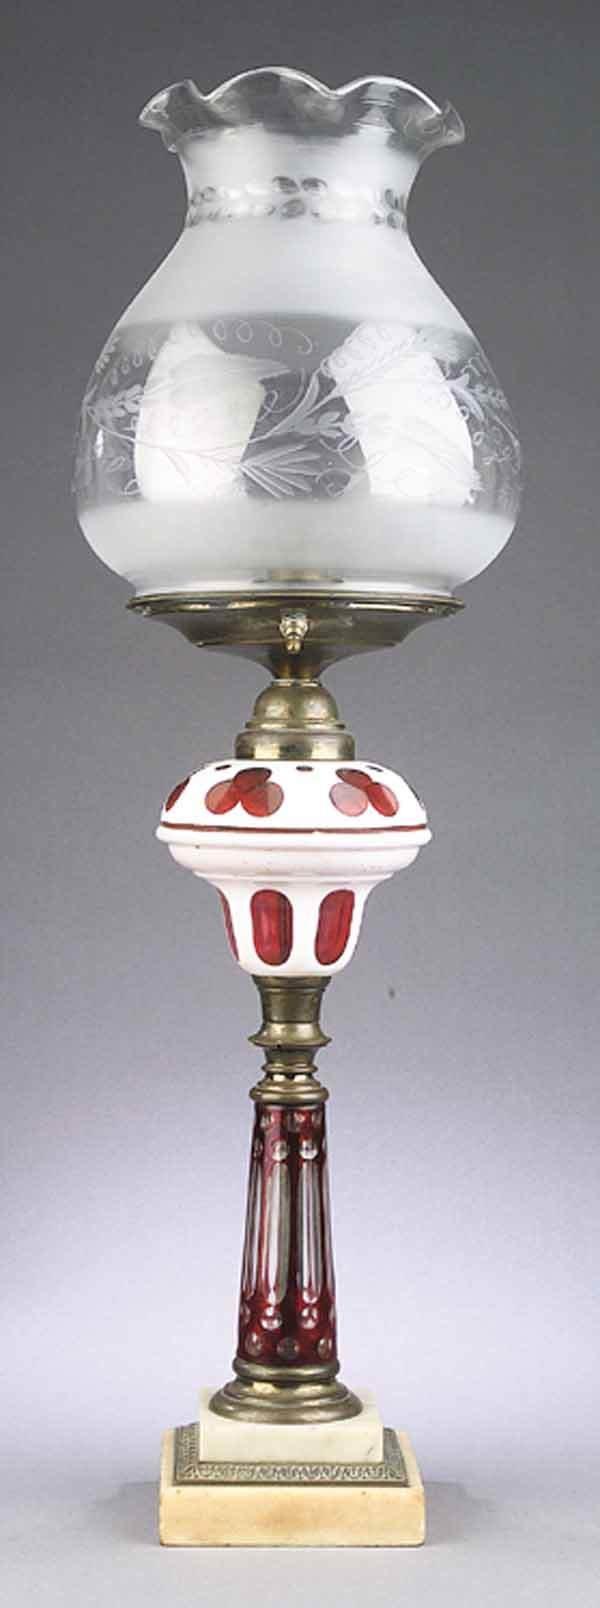 0266: New England Cranberry Etc. Solar Lamp